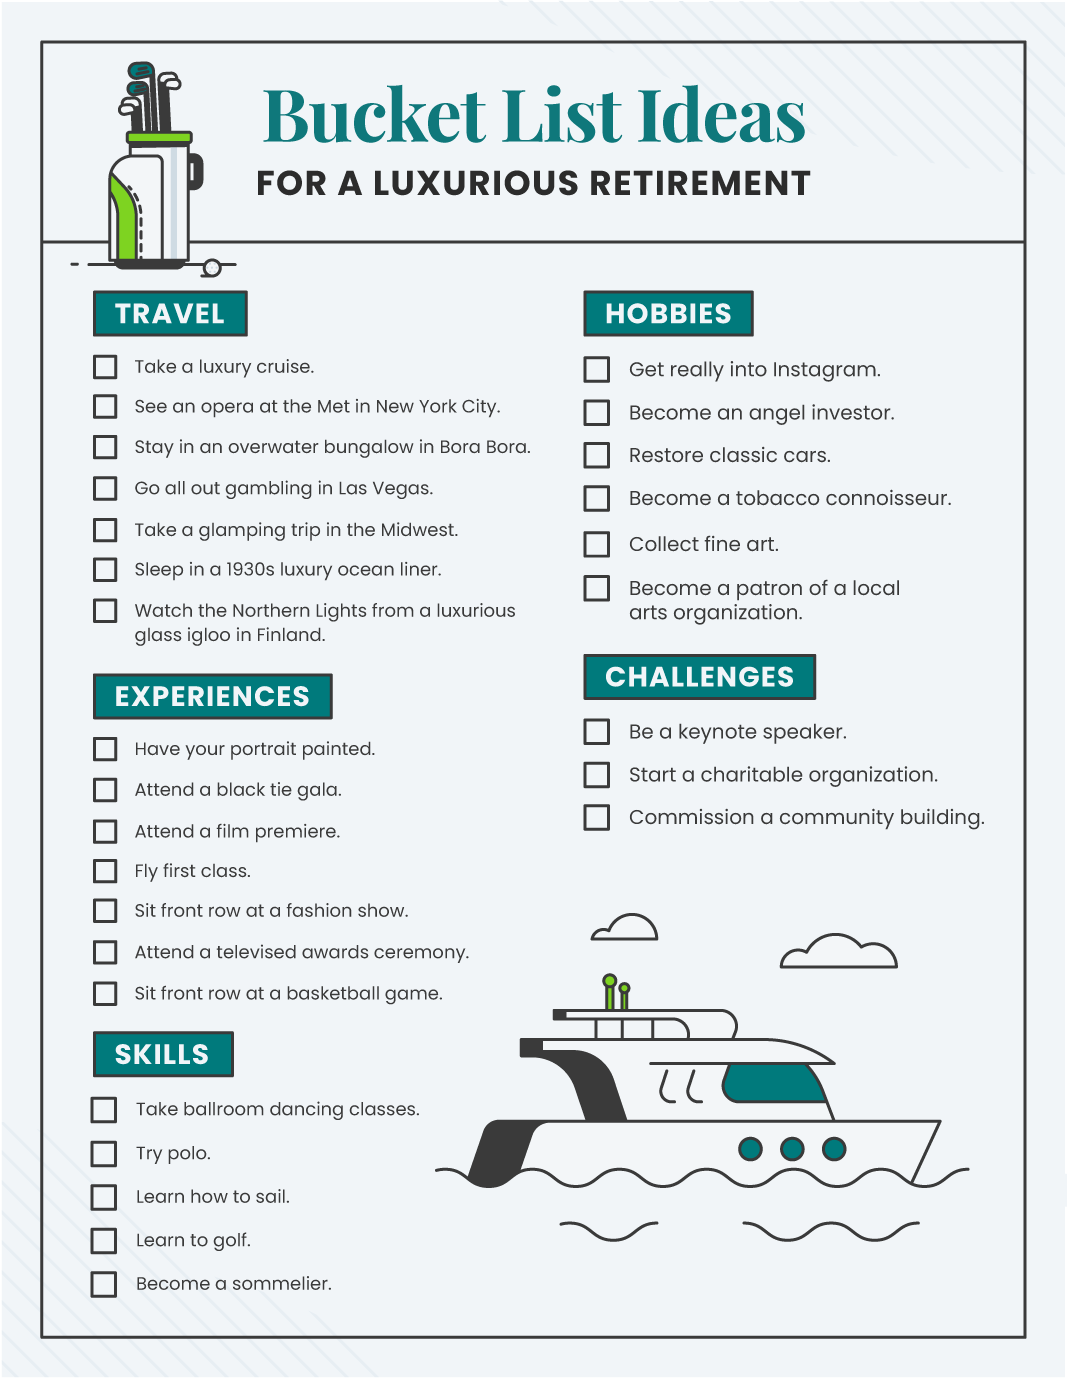 20+ Bucket List Ideas for Retirement   Annuity.org